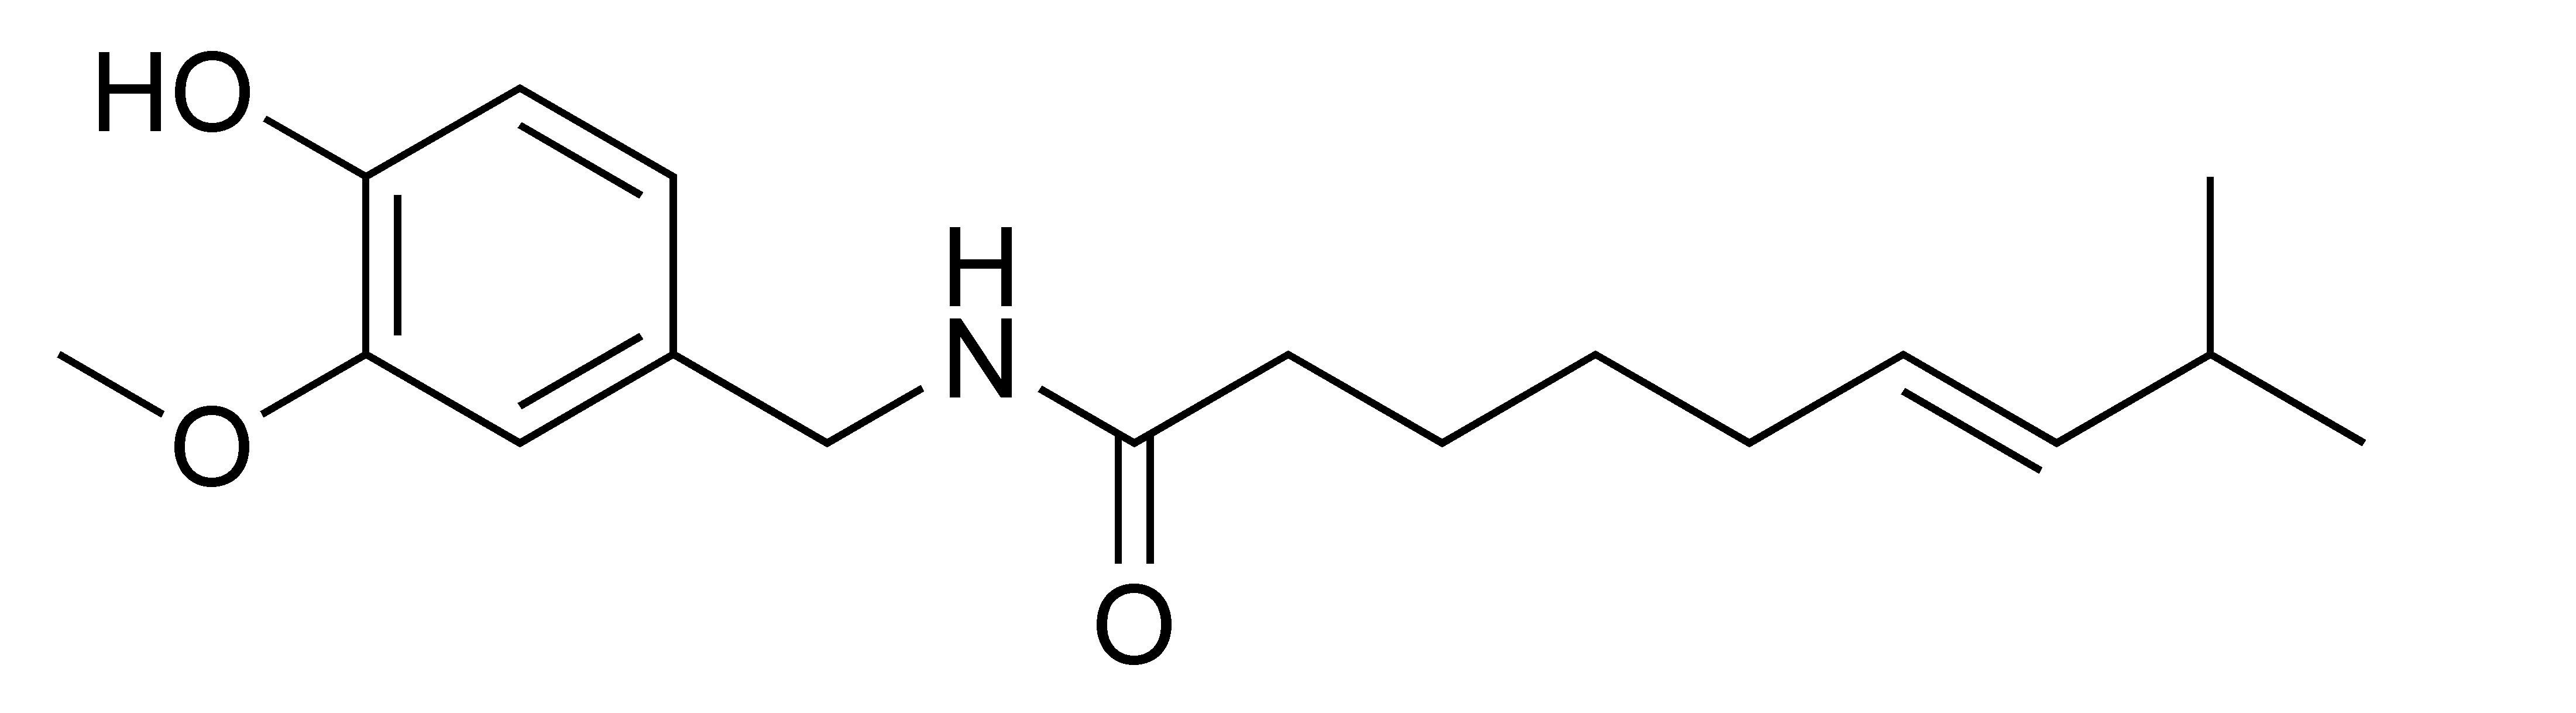 Natural Gas Molecule Size